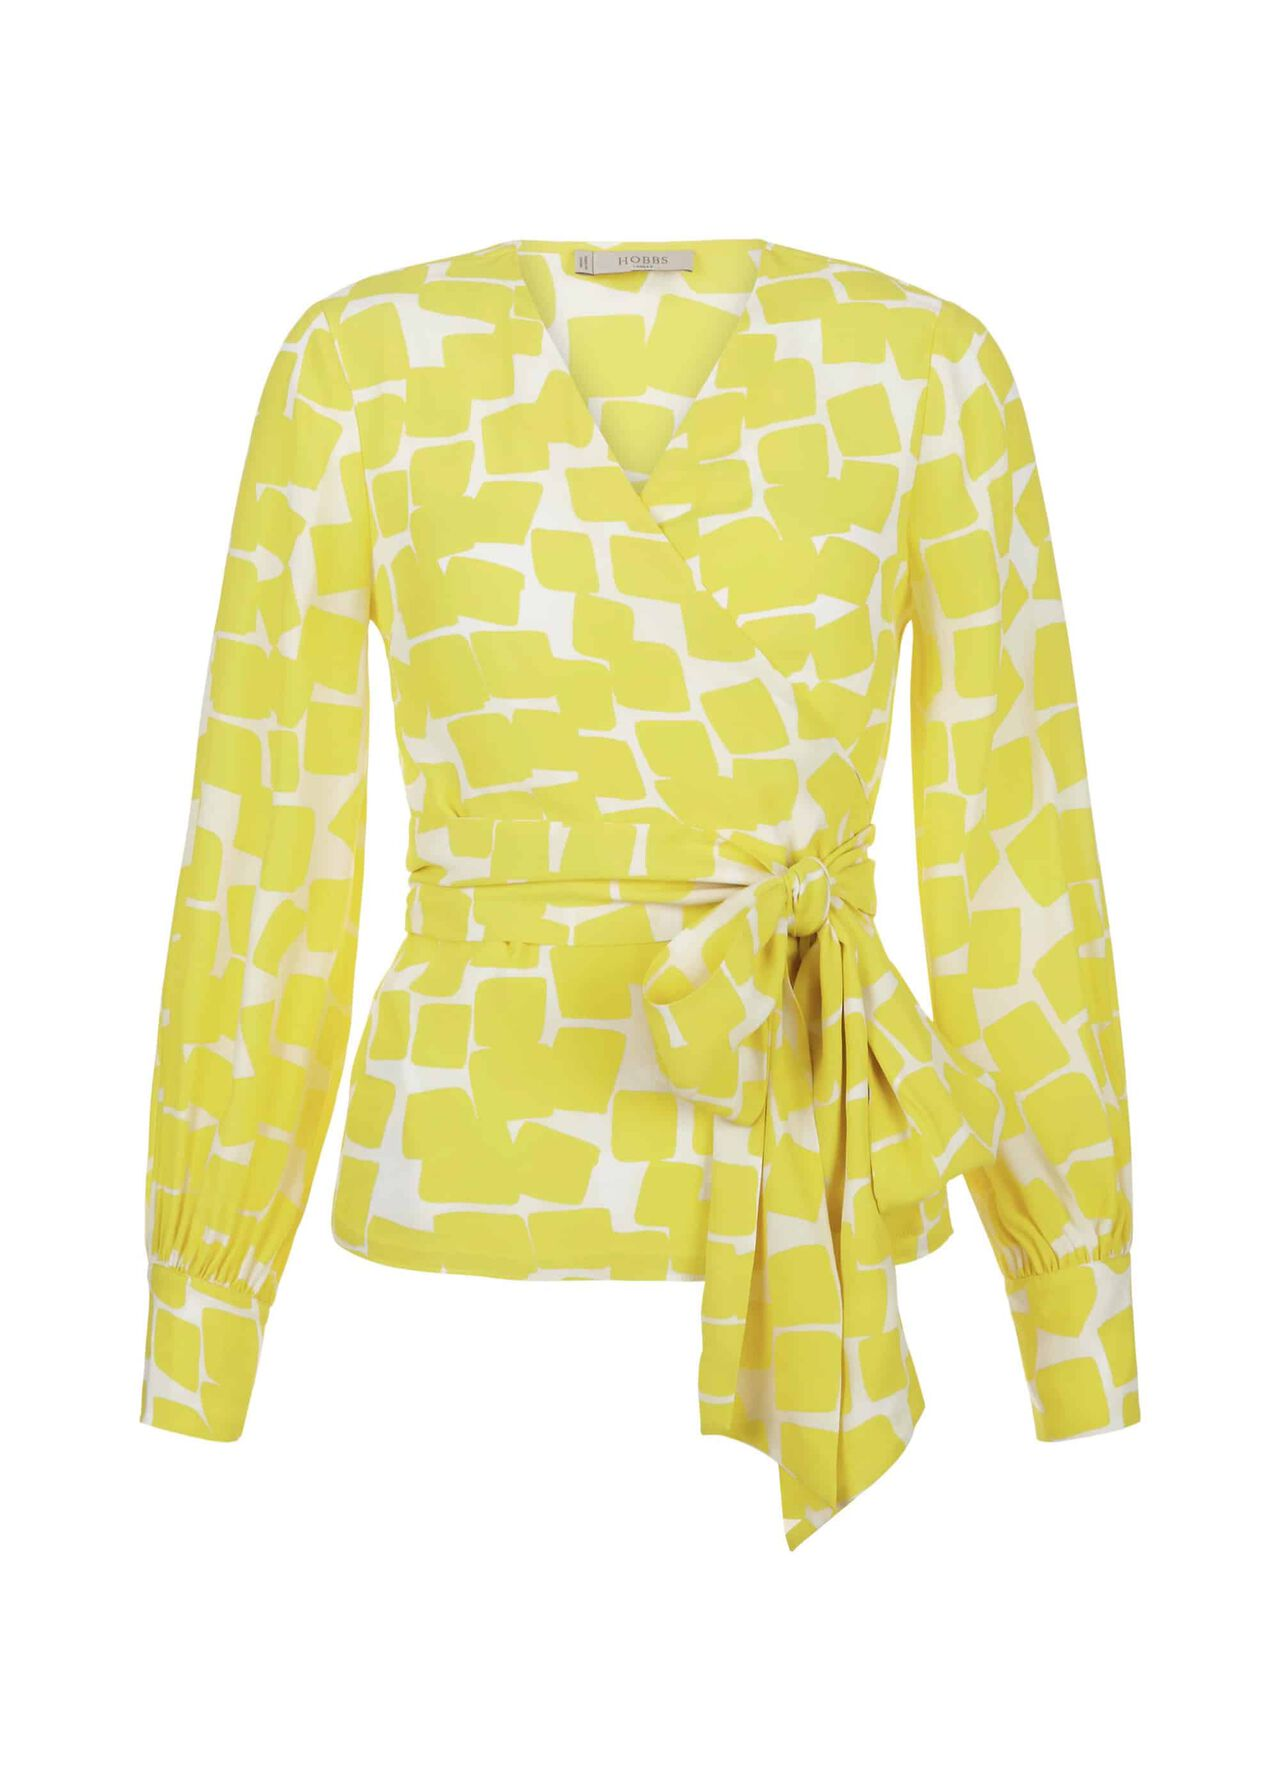 Tallulah Top Yellow Ivory